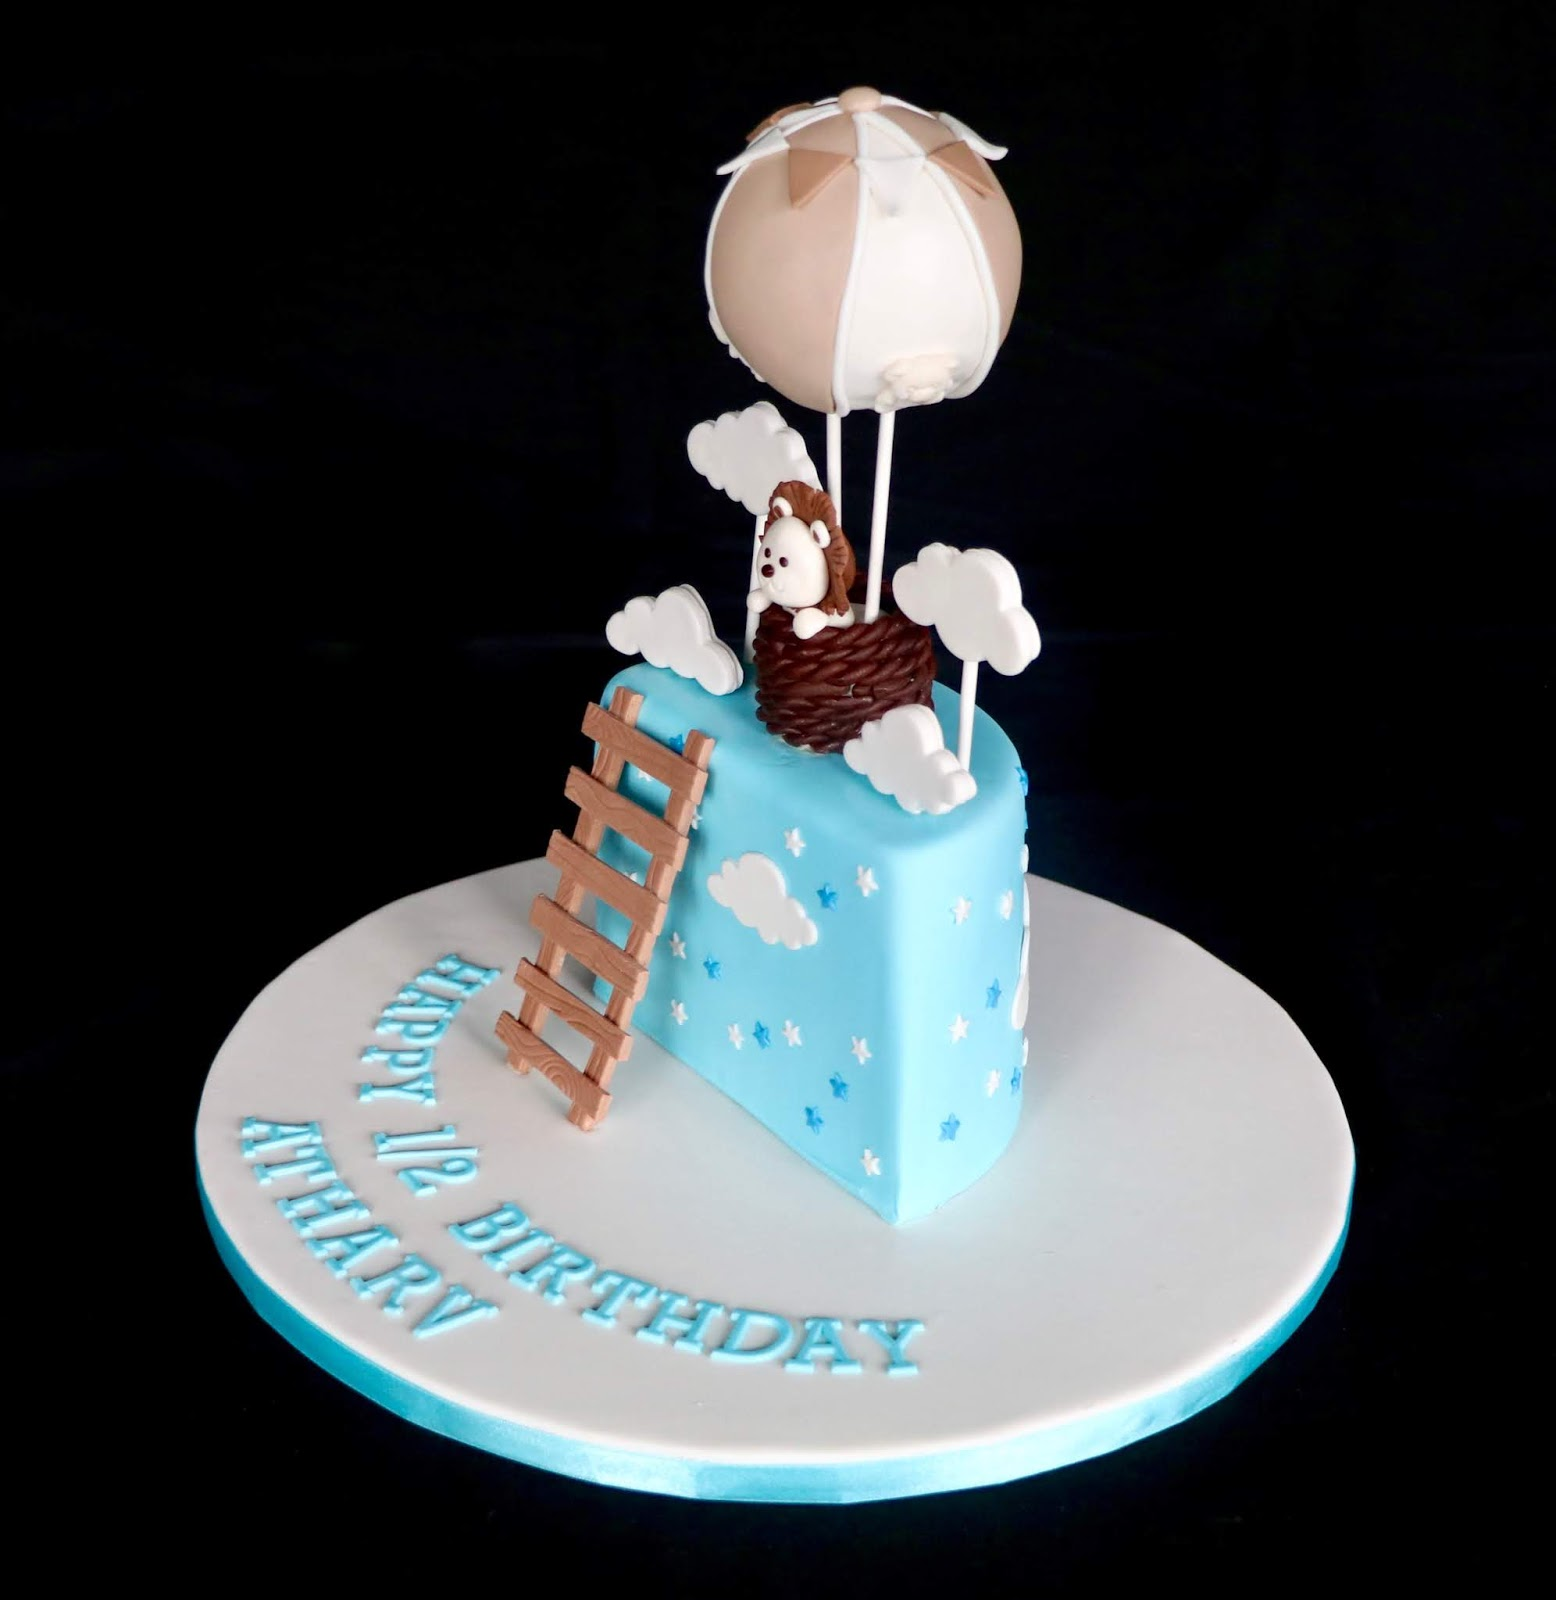 Baking Maniac 1 2 Birthday Cake